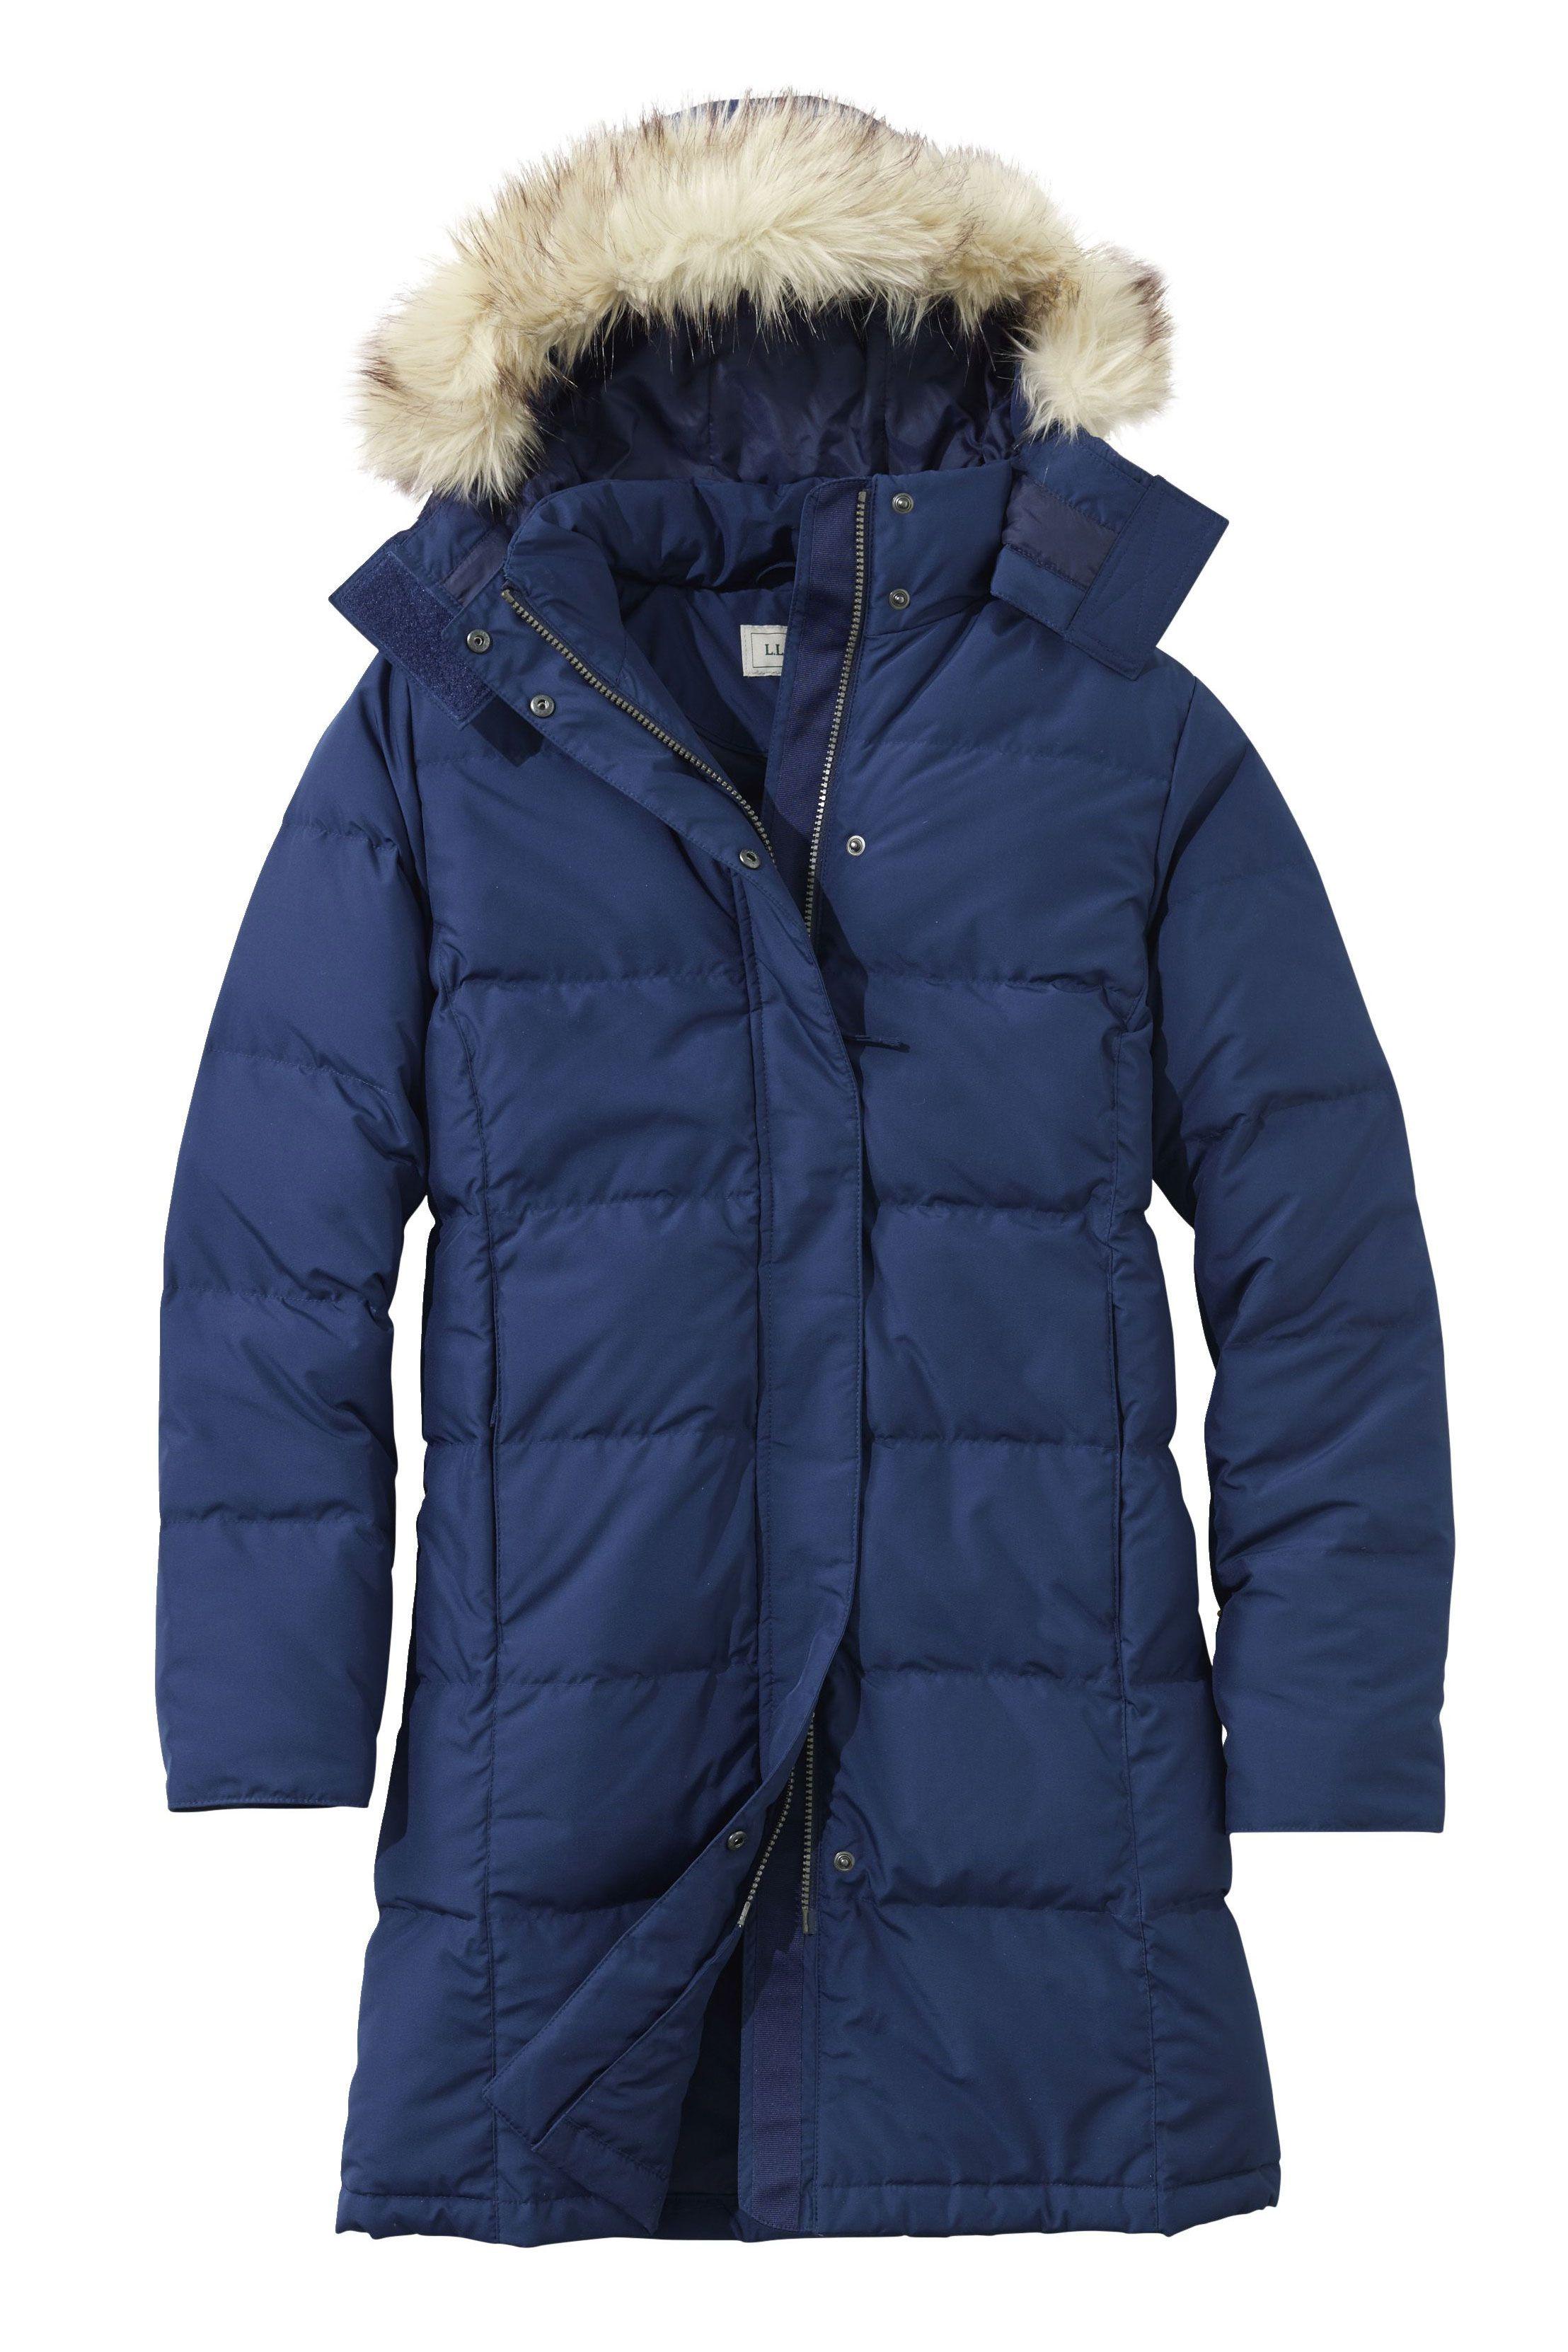 l.l. bean ultrawarm coat